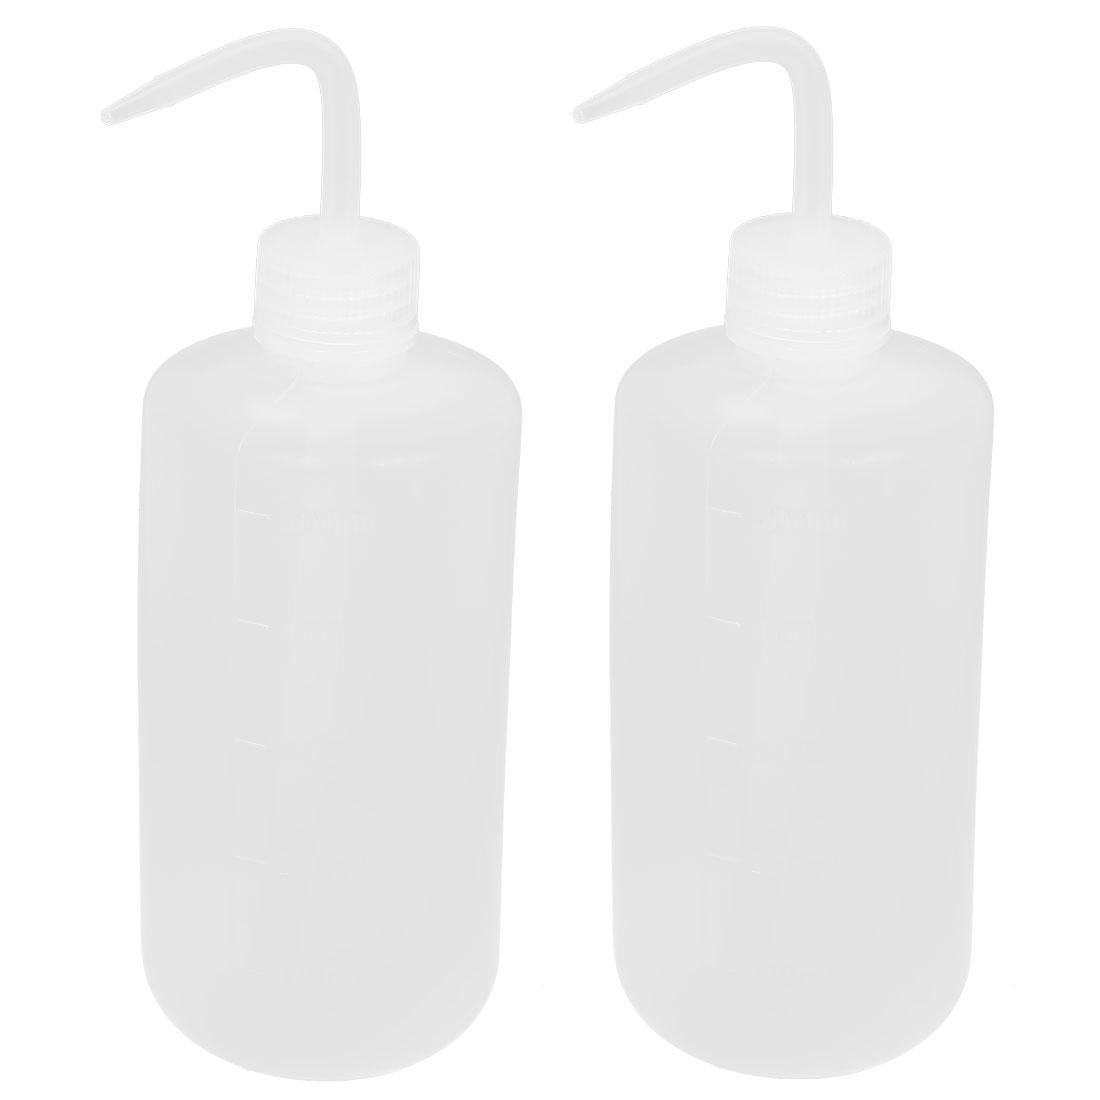 Lab Right Angle Bent Tip Plastic Liquid Storage Squeeze Bottle Dispenser 500mL 2pcs